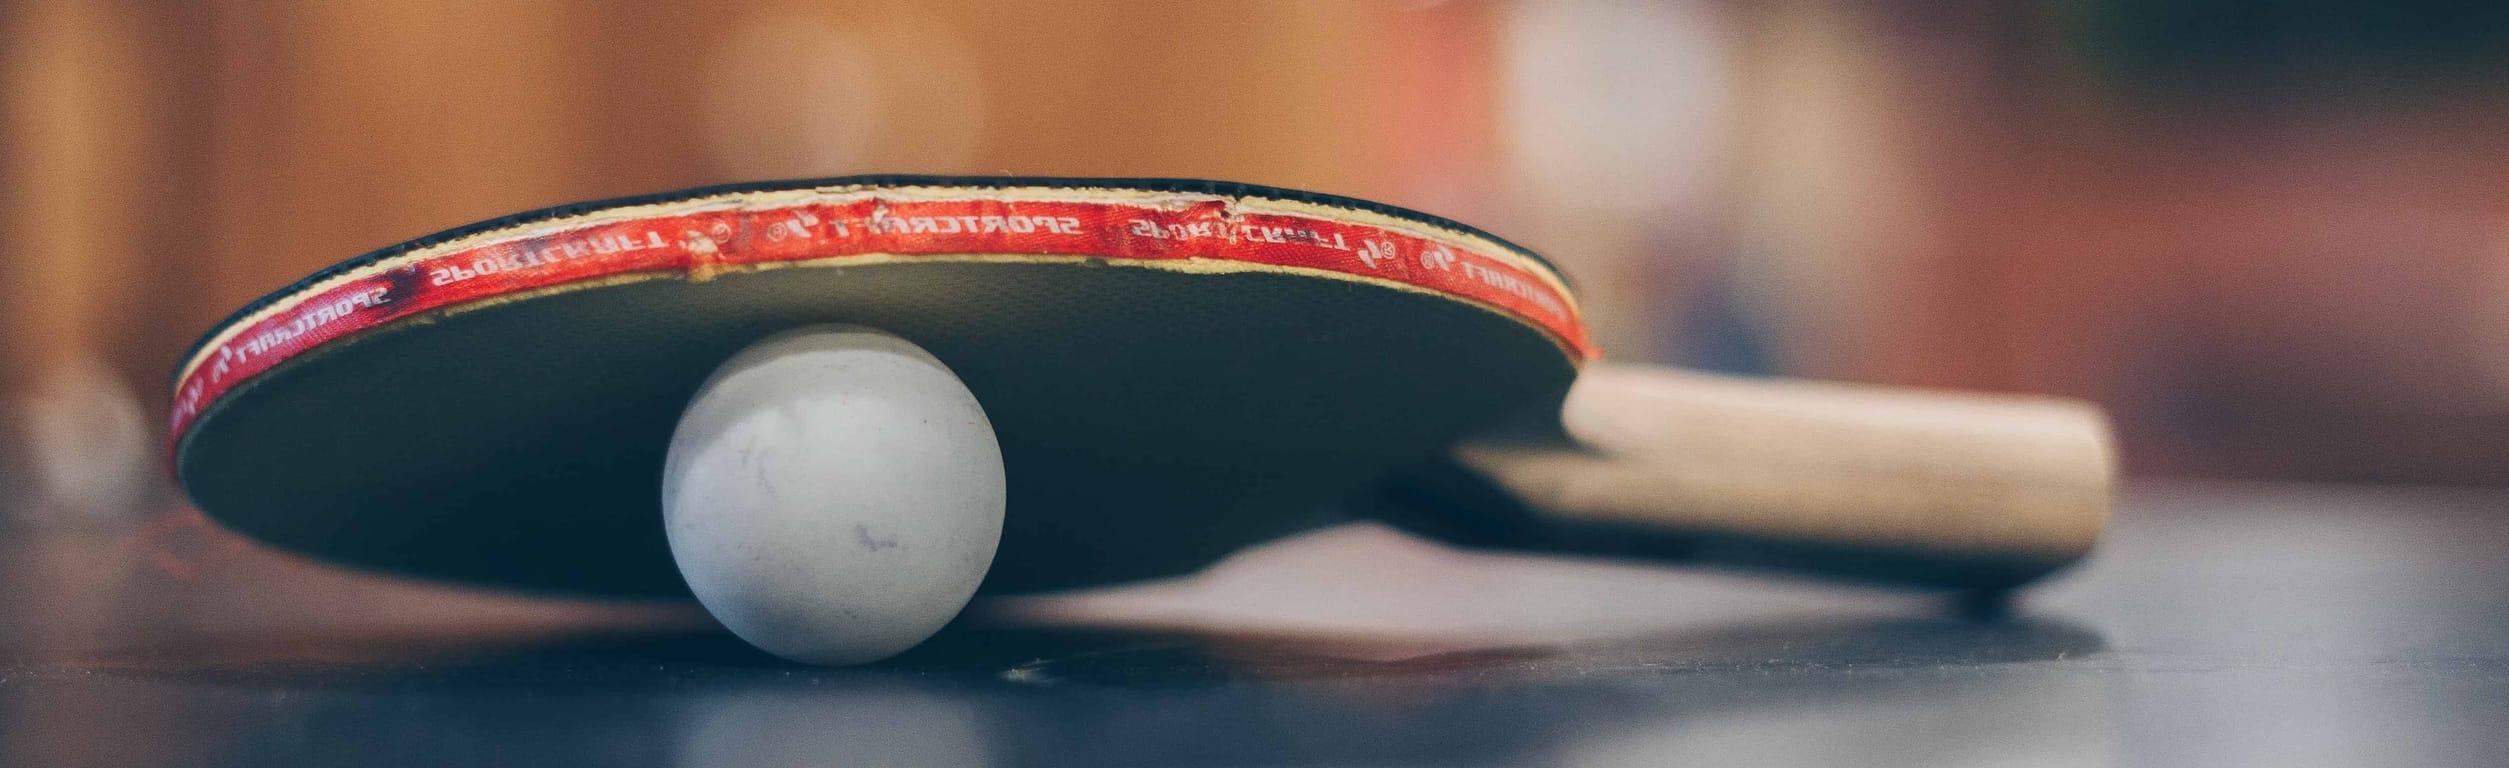 Paita Tennis de Table